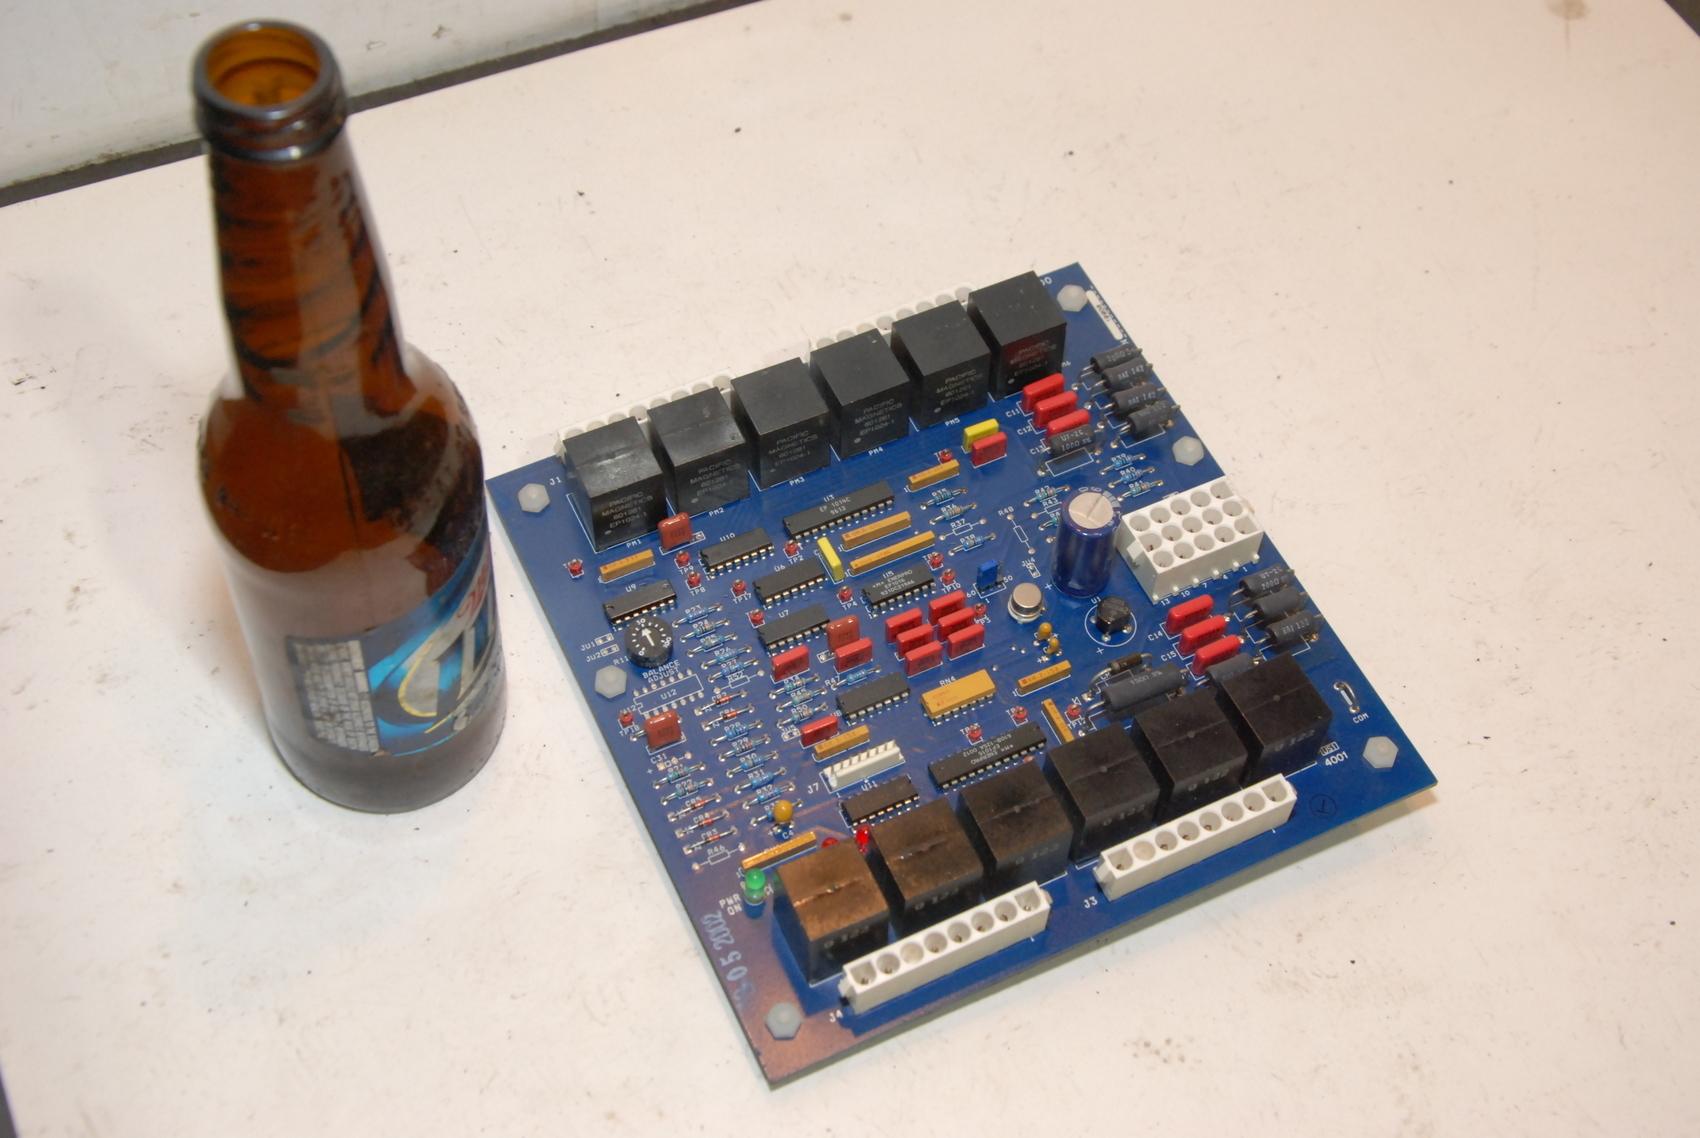 Liebert Enerpro 12-765036-12 76503612 PCB circuit board KMGM